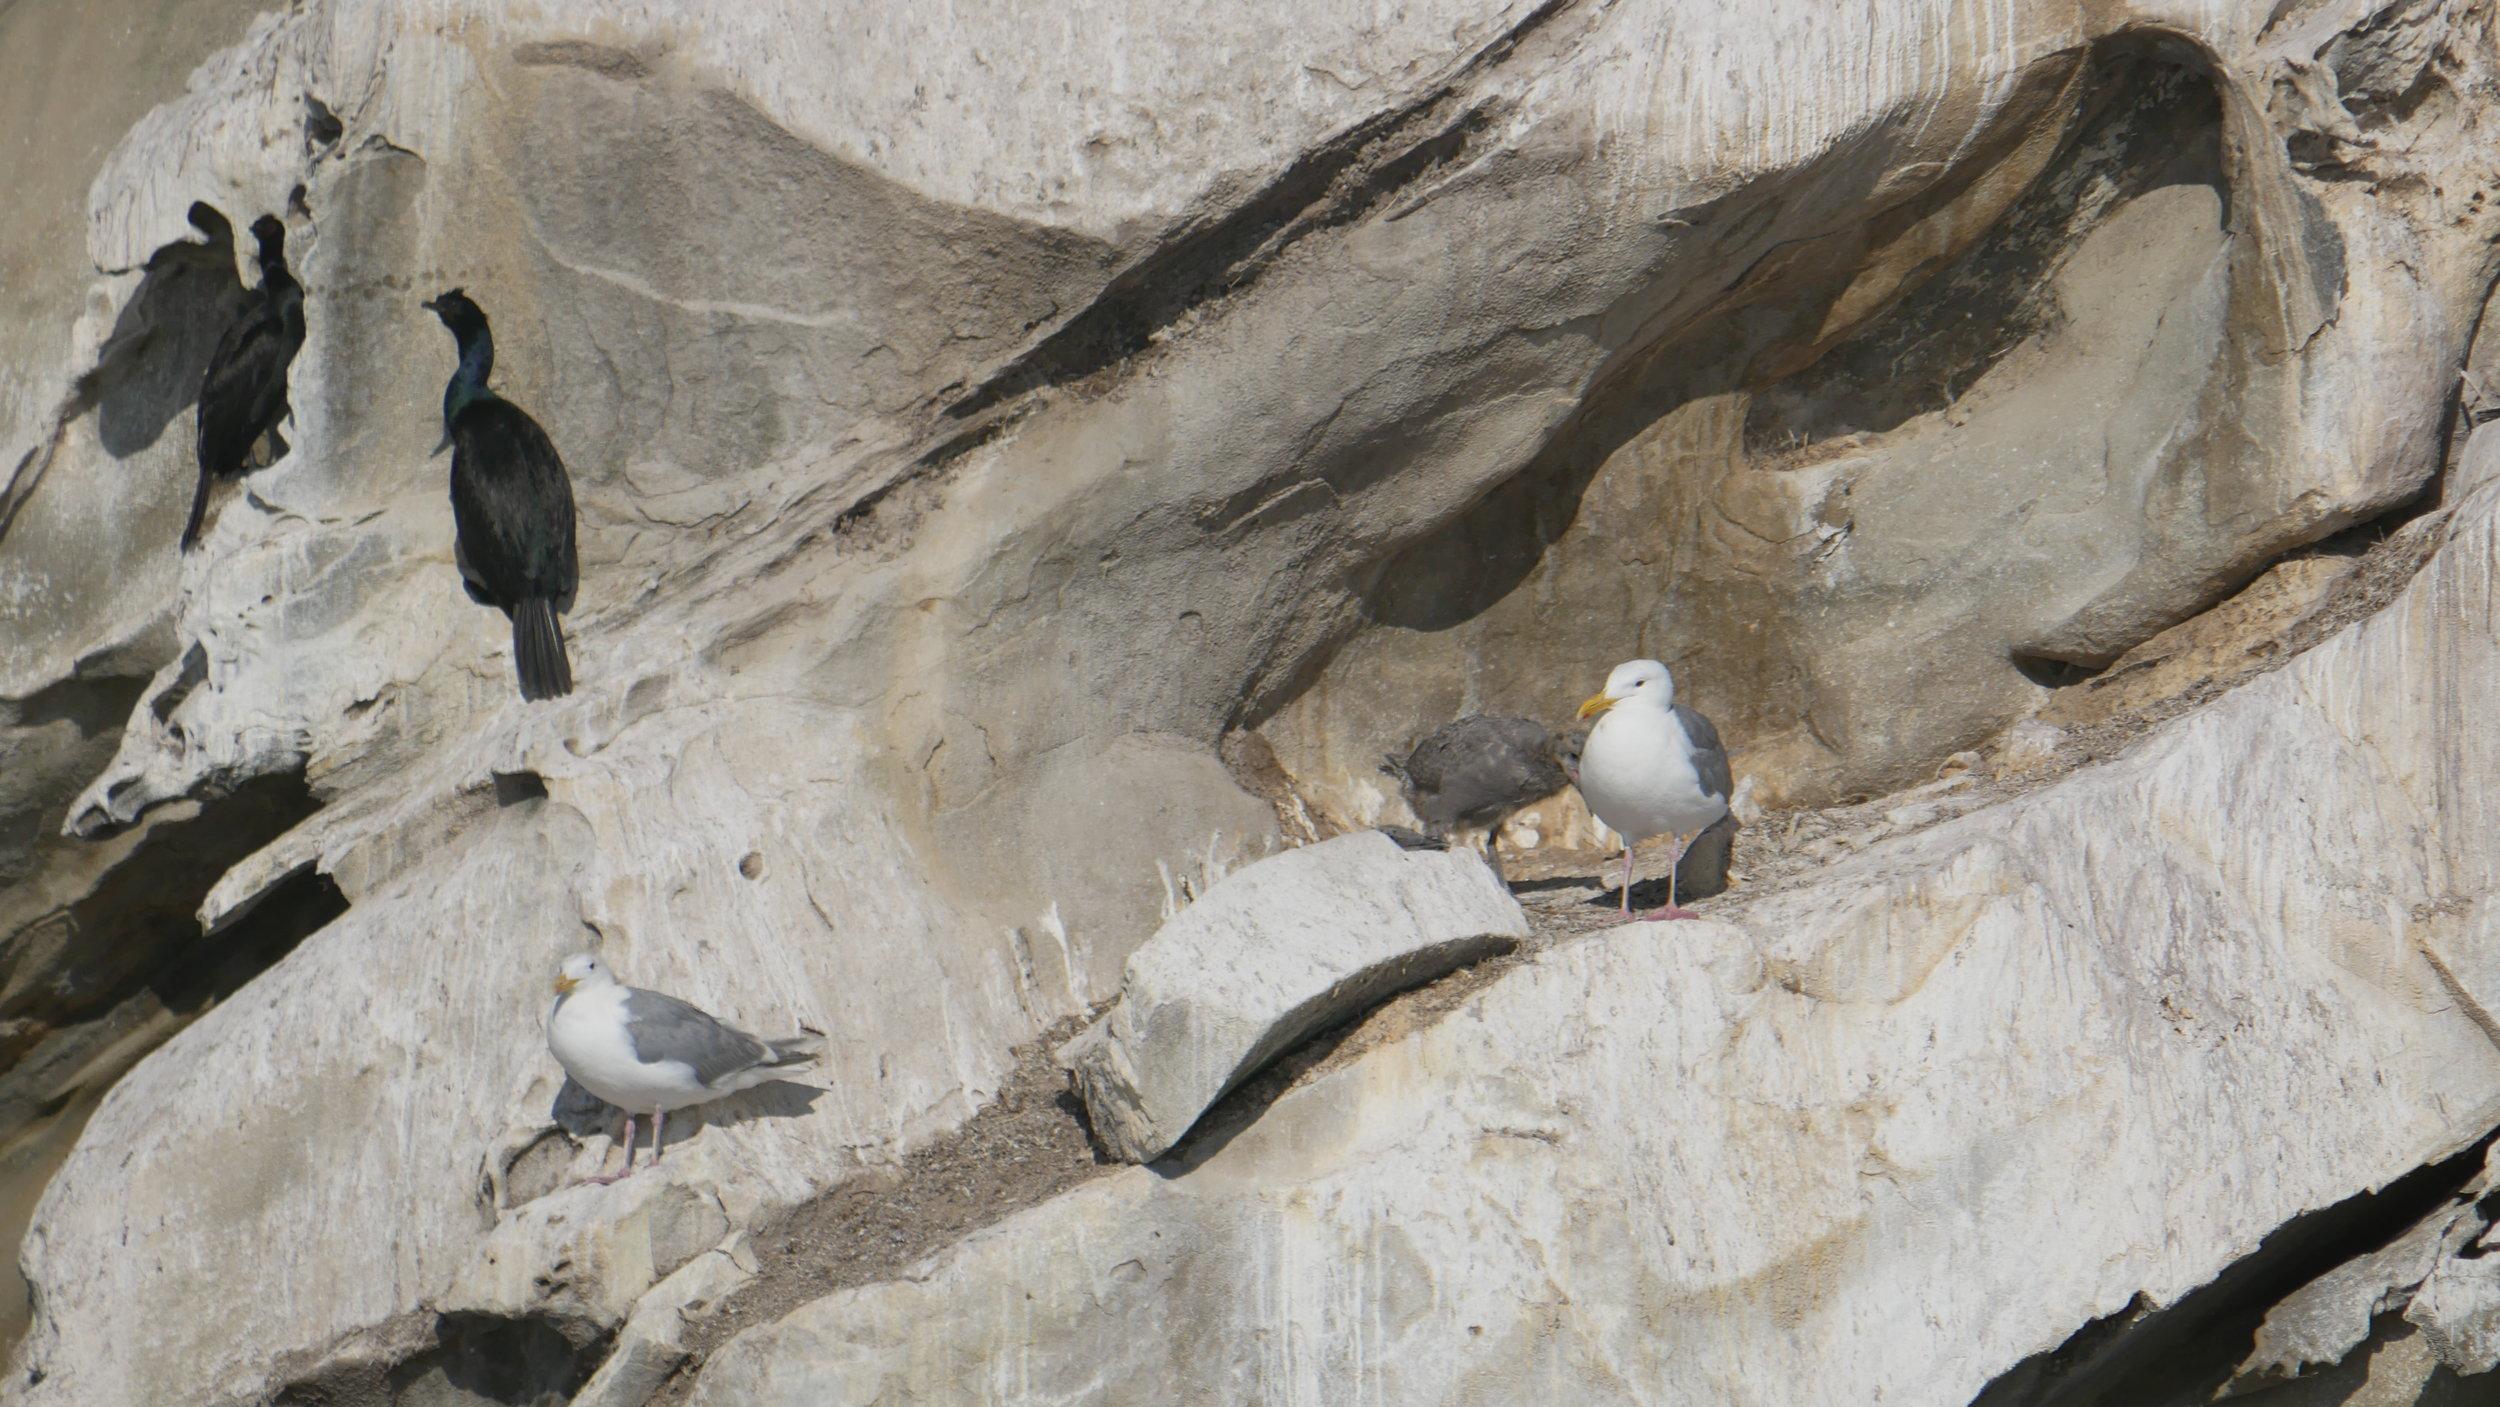 Seagulls and cormorants at Gabriola Island. Photo by Cheyenne Brewster (3:30).